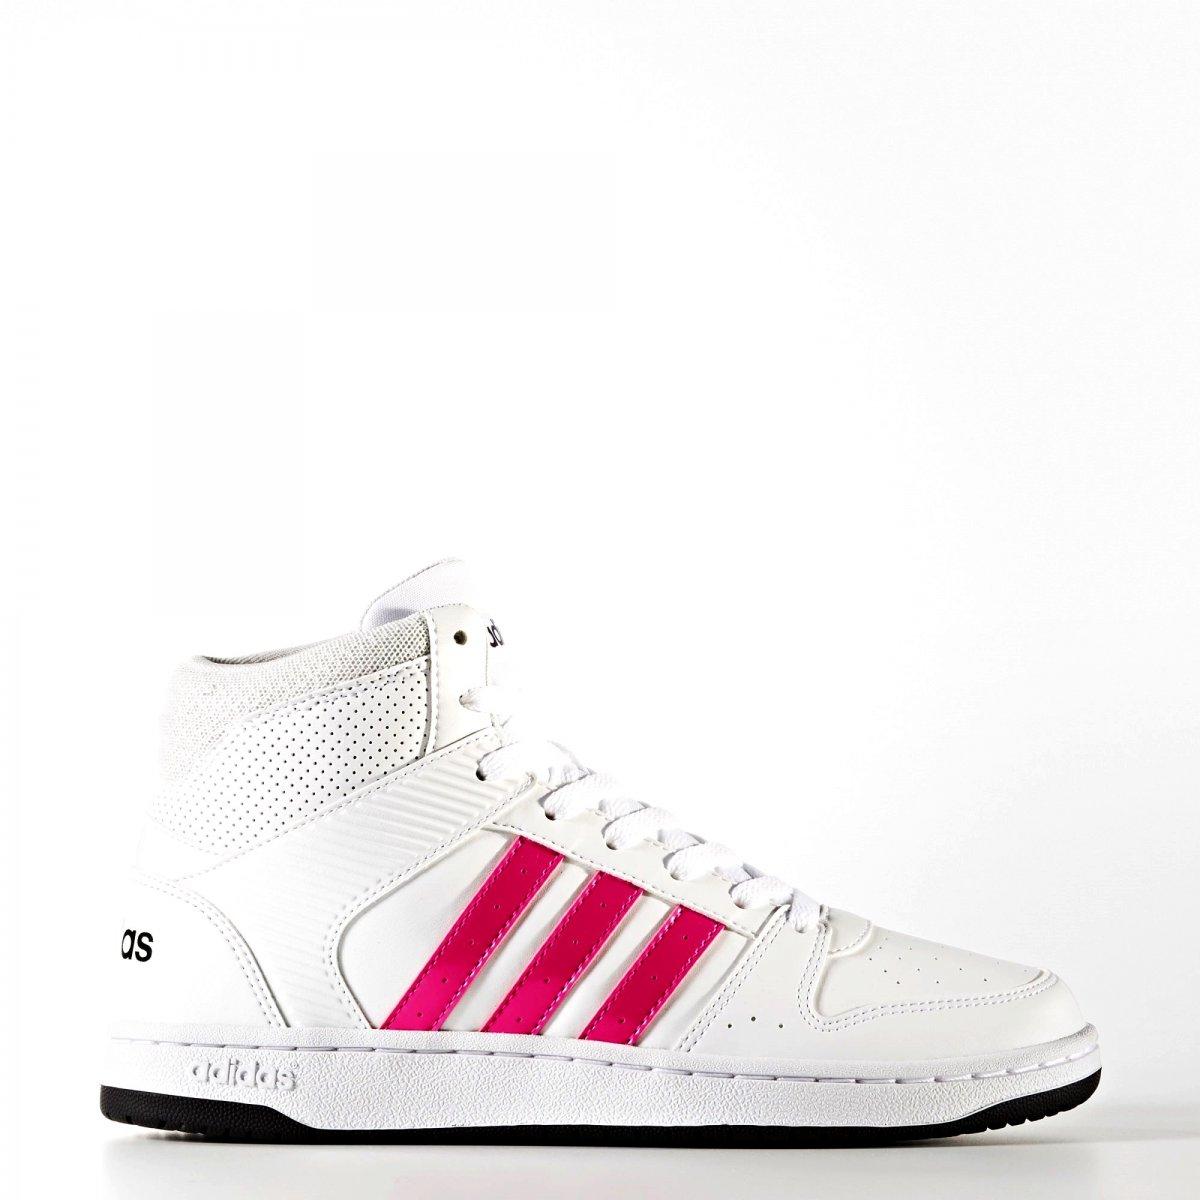 Tênis Adidas VS Hoopster MID W B74234 Branco Rosa 54be27a69cf